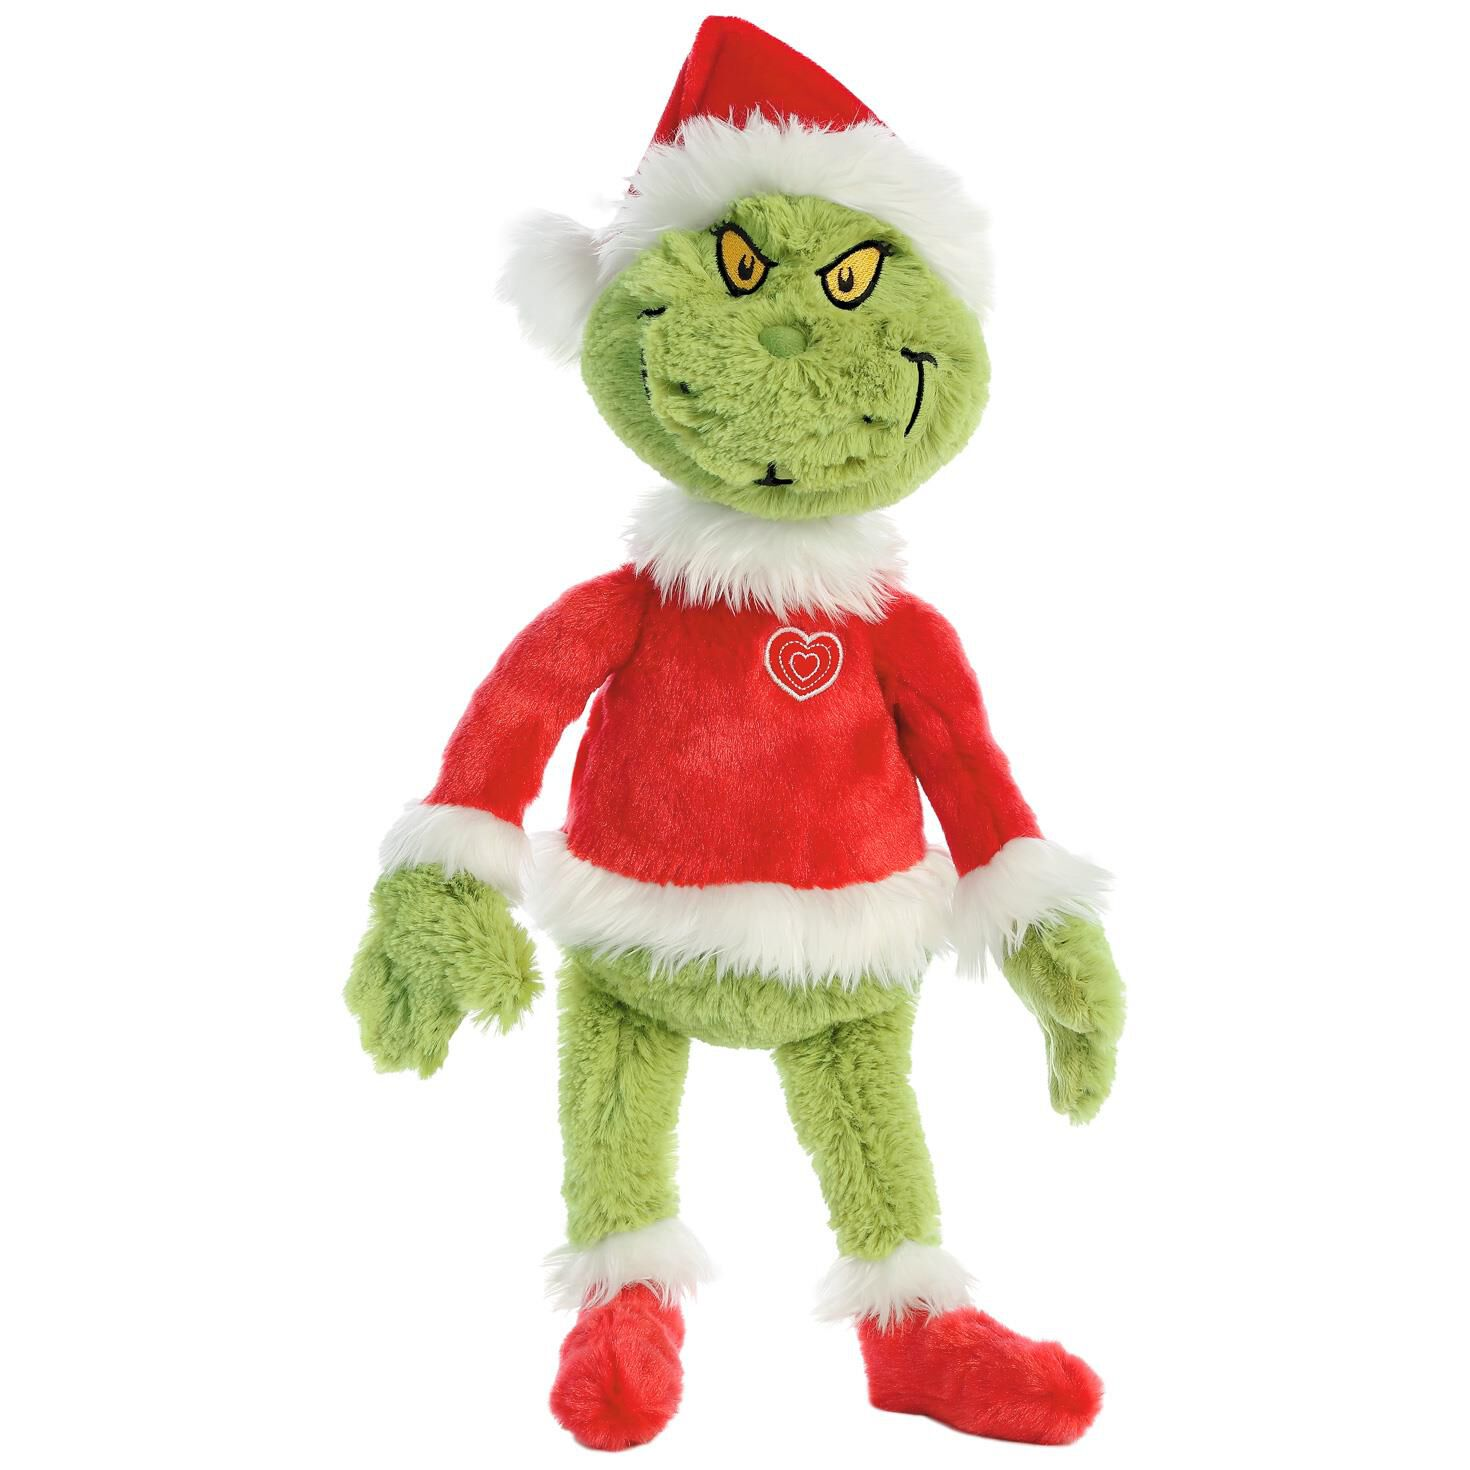 How the Grinch Stole Christmas Grinch Santa Stuffed Animal, 19 ...